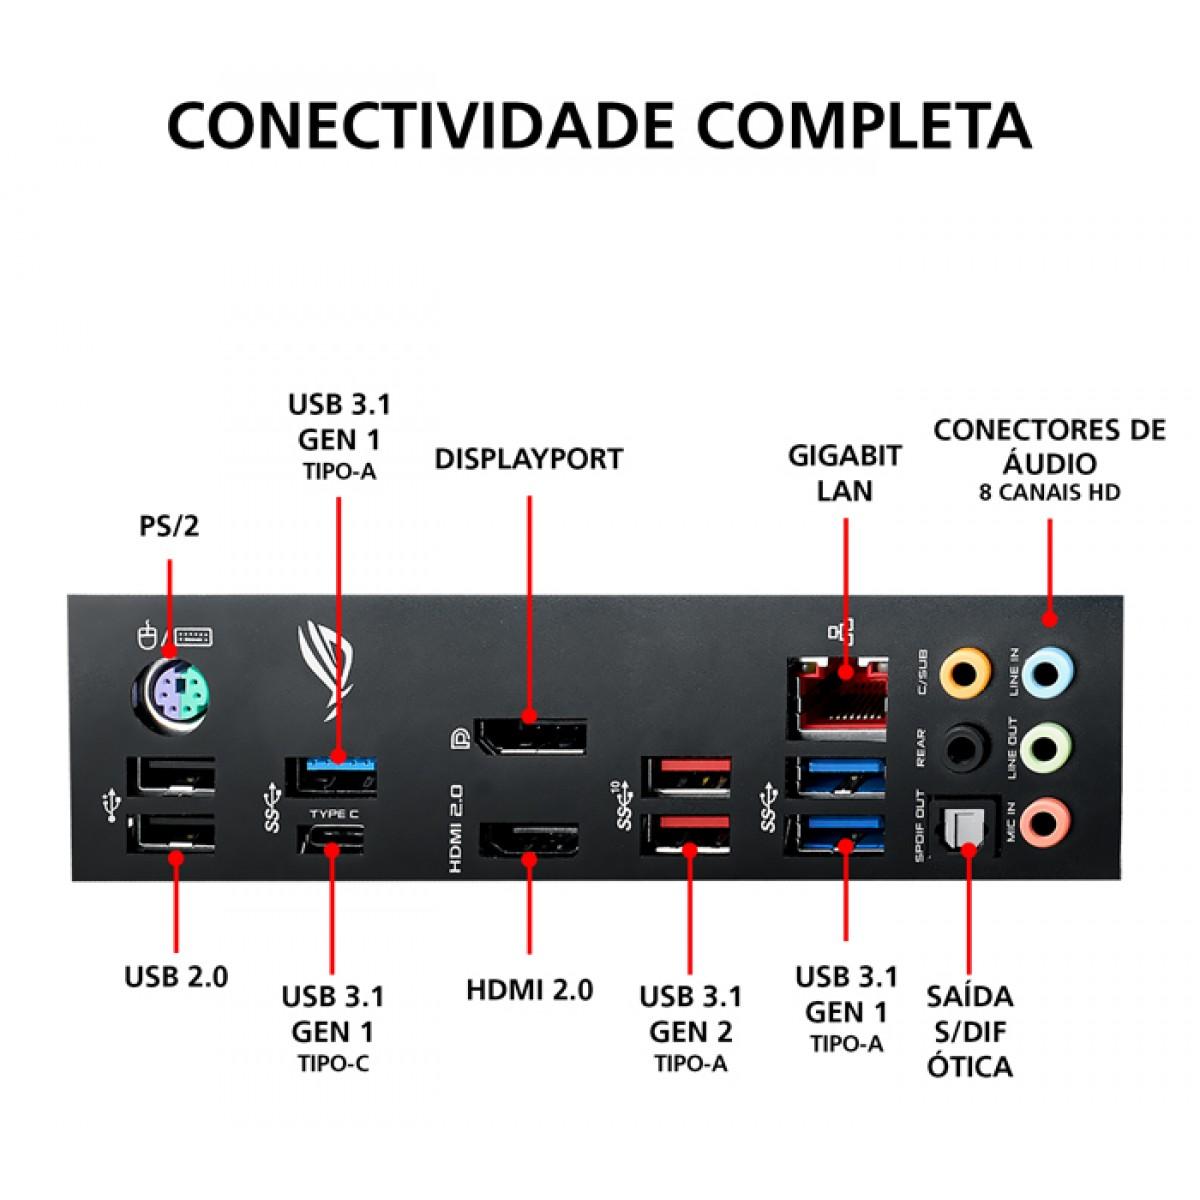 Placa Mãe Asus ROG STRIX B450-E GAMING Wifi, Chipset B450, AMD AM4, ATX, DDR4